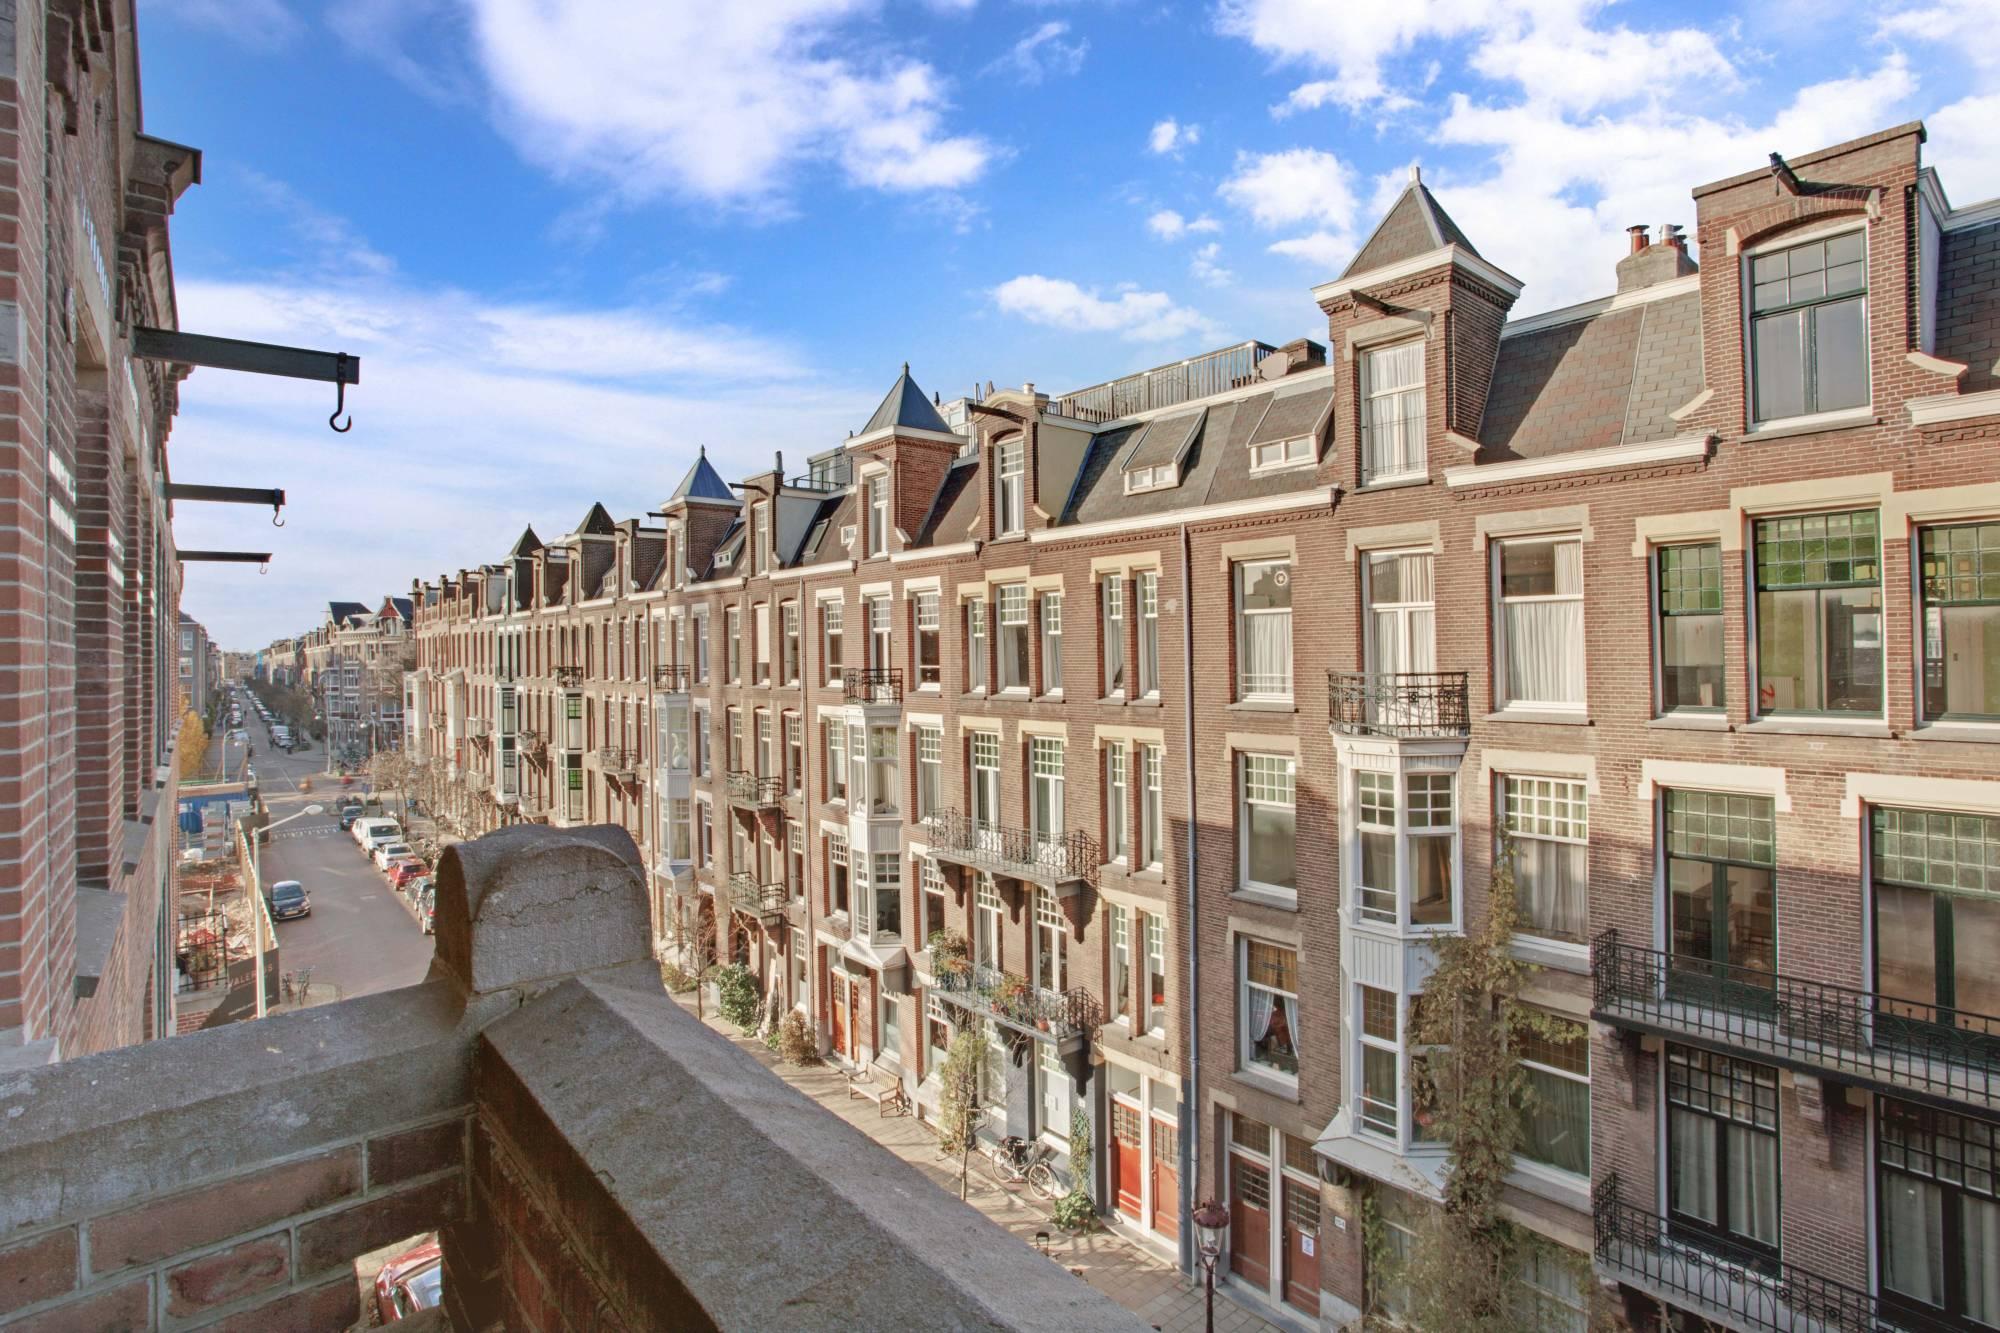 Valeriusstraat / Amsterdam